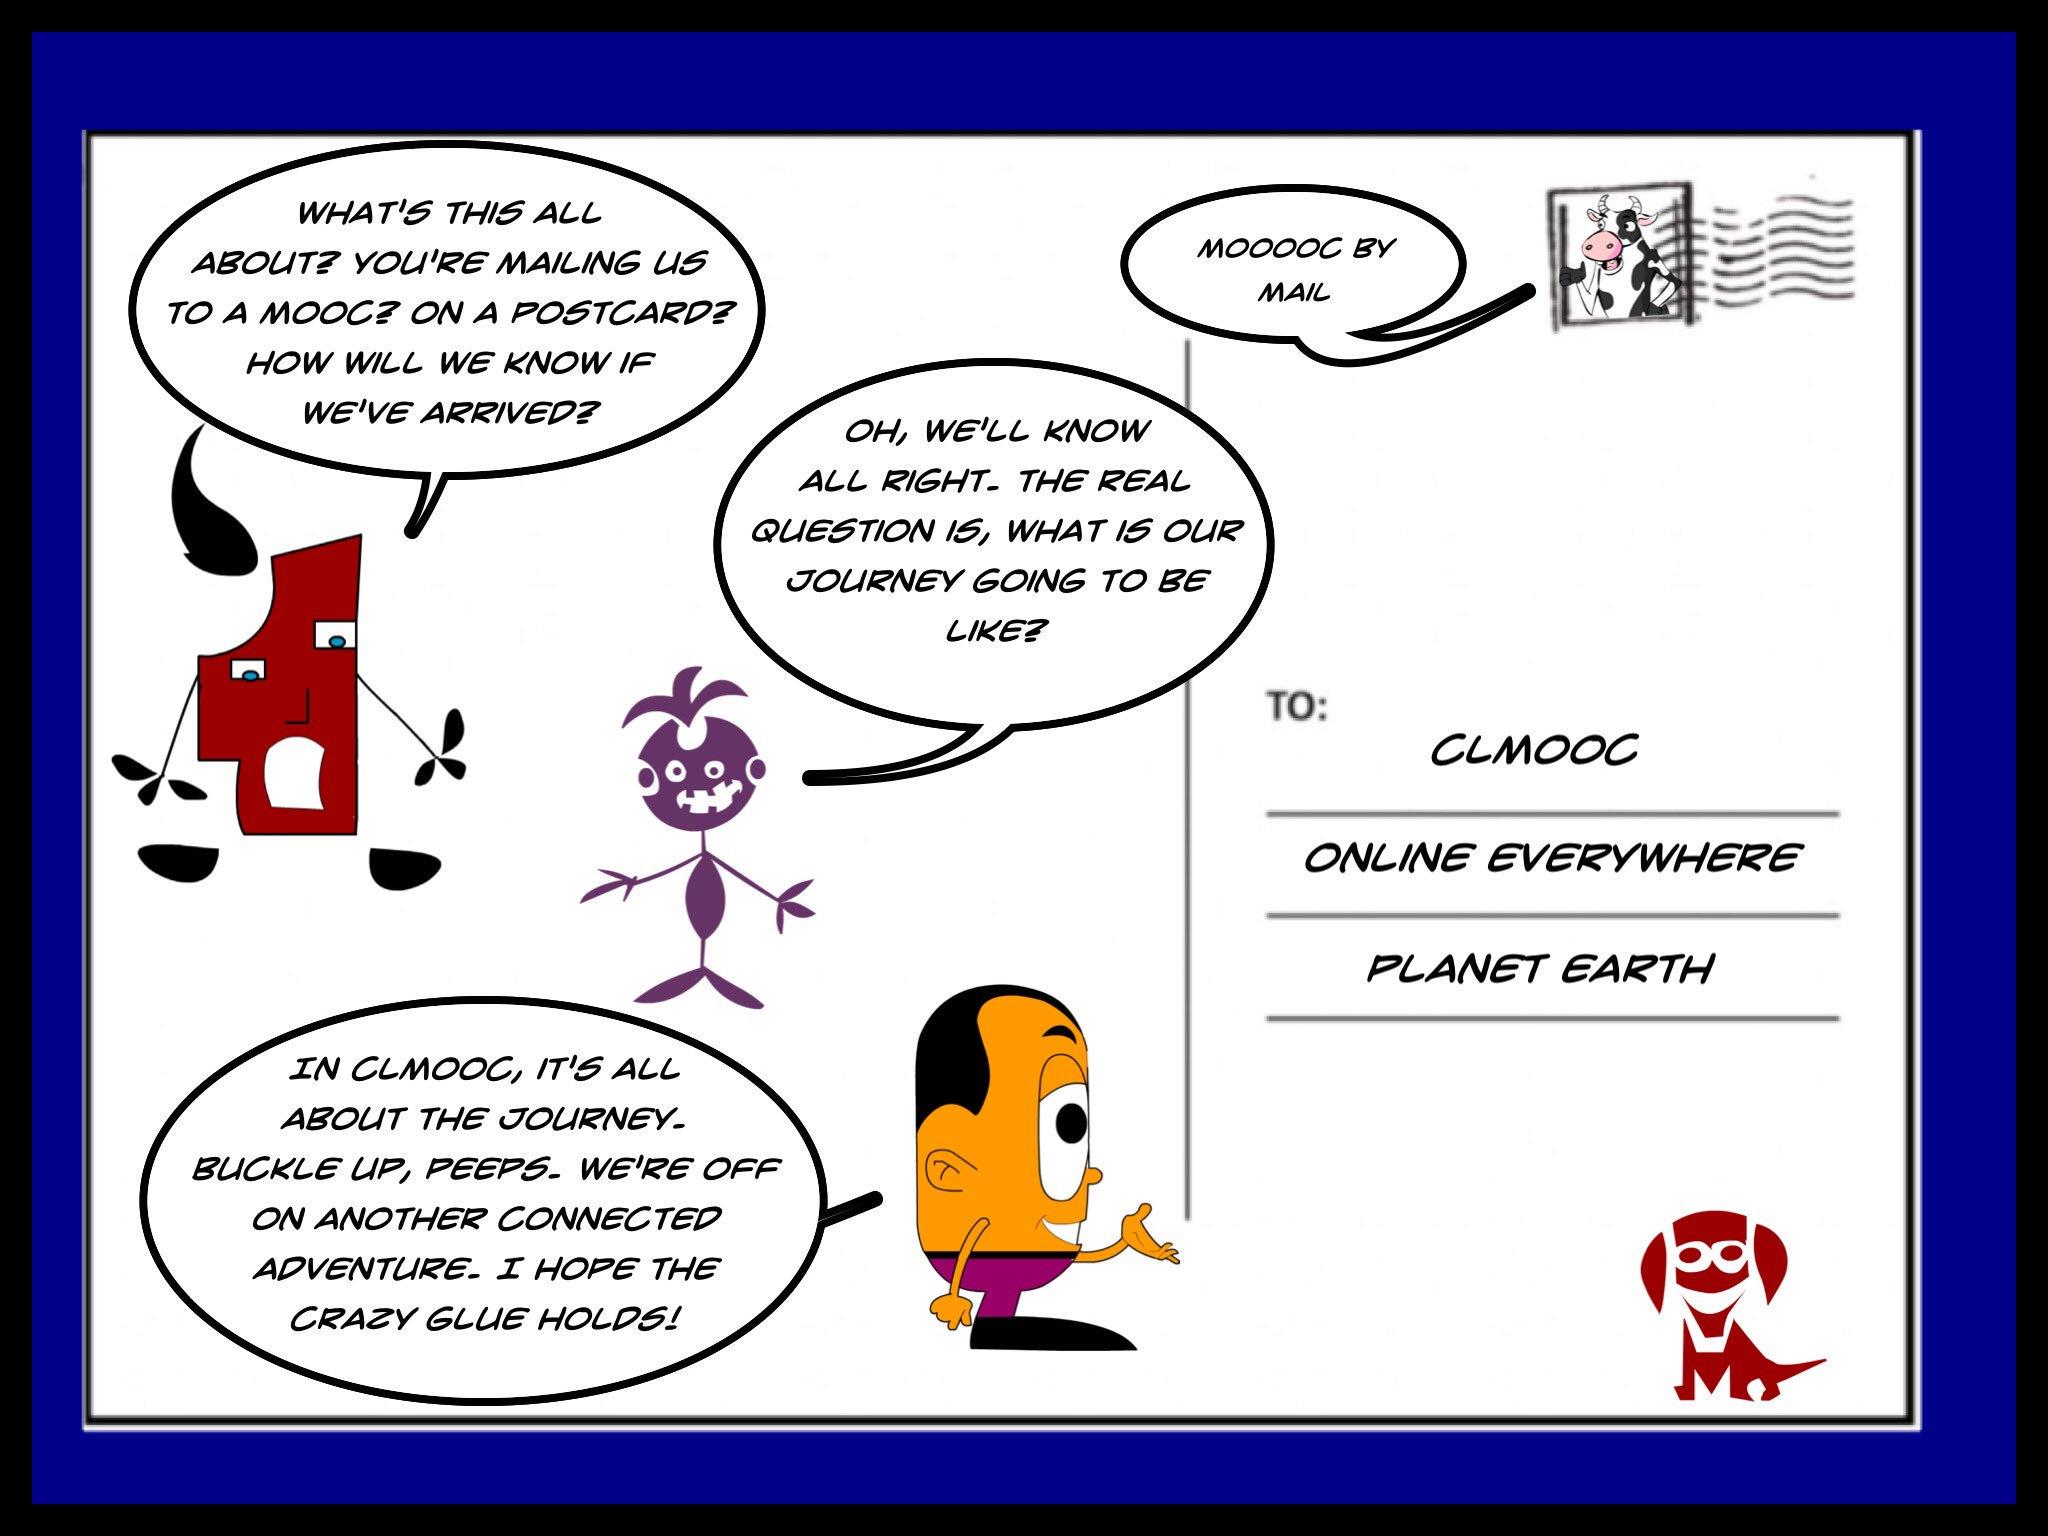 A #CLMOOC postcard comic ... I hope the 'crazy glue' holds! https://t.co/azuxZyyrps